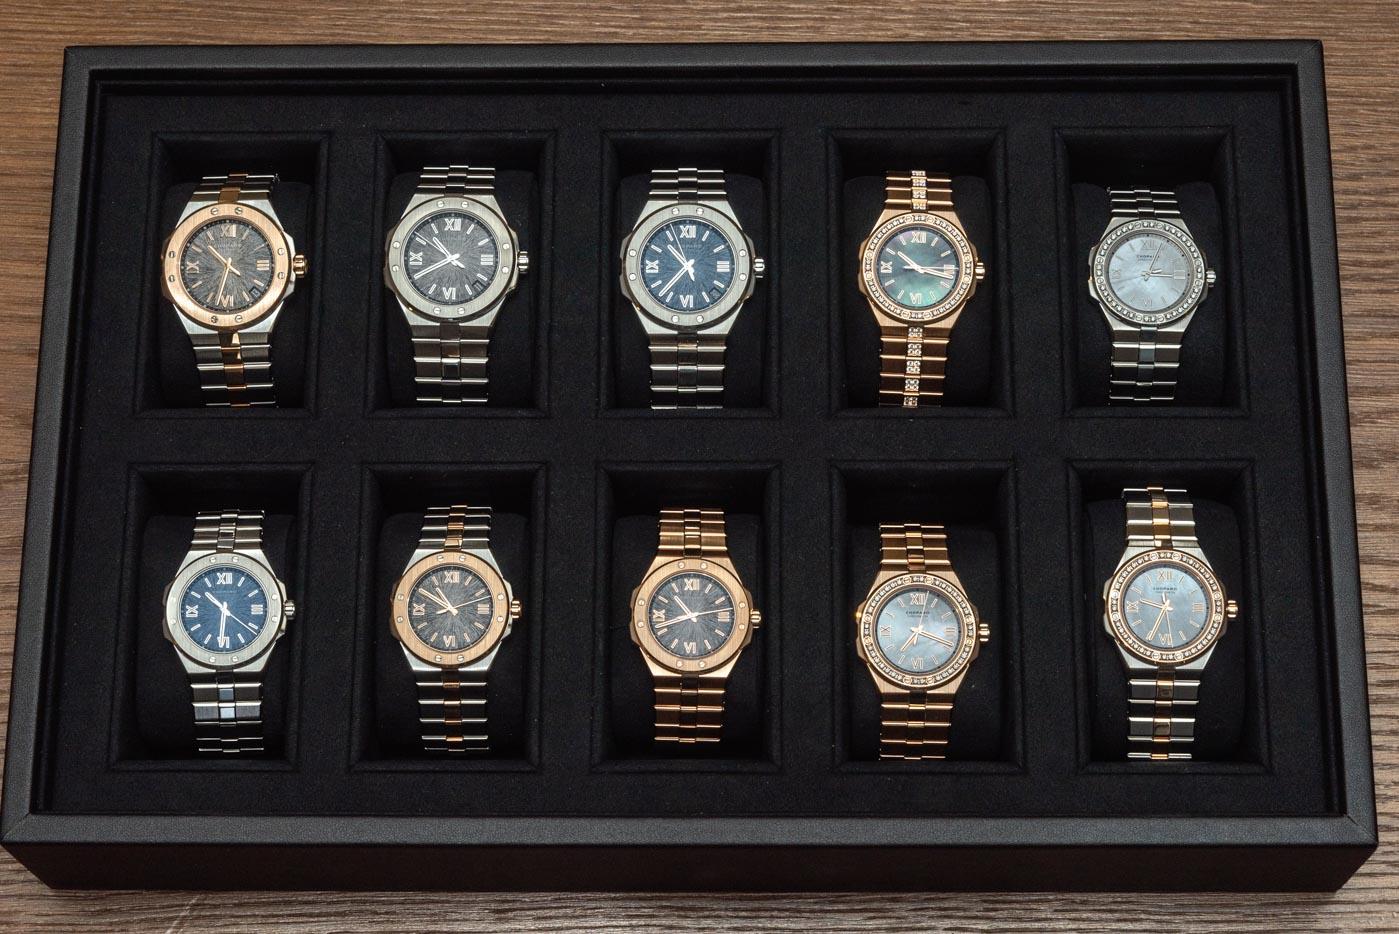 Chopard-Alpine-Eagle-Gold-Steel-Luxury-Sports-Watch-aBlogtoWatch-66.